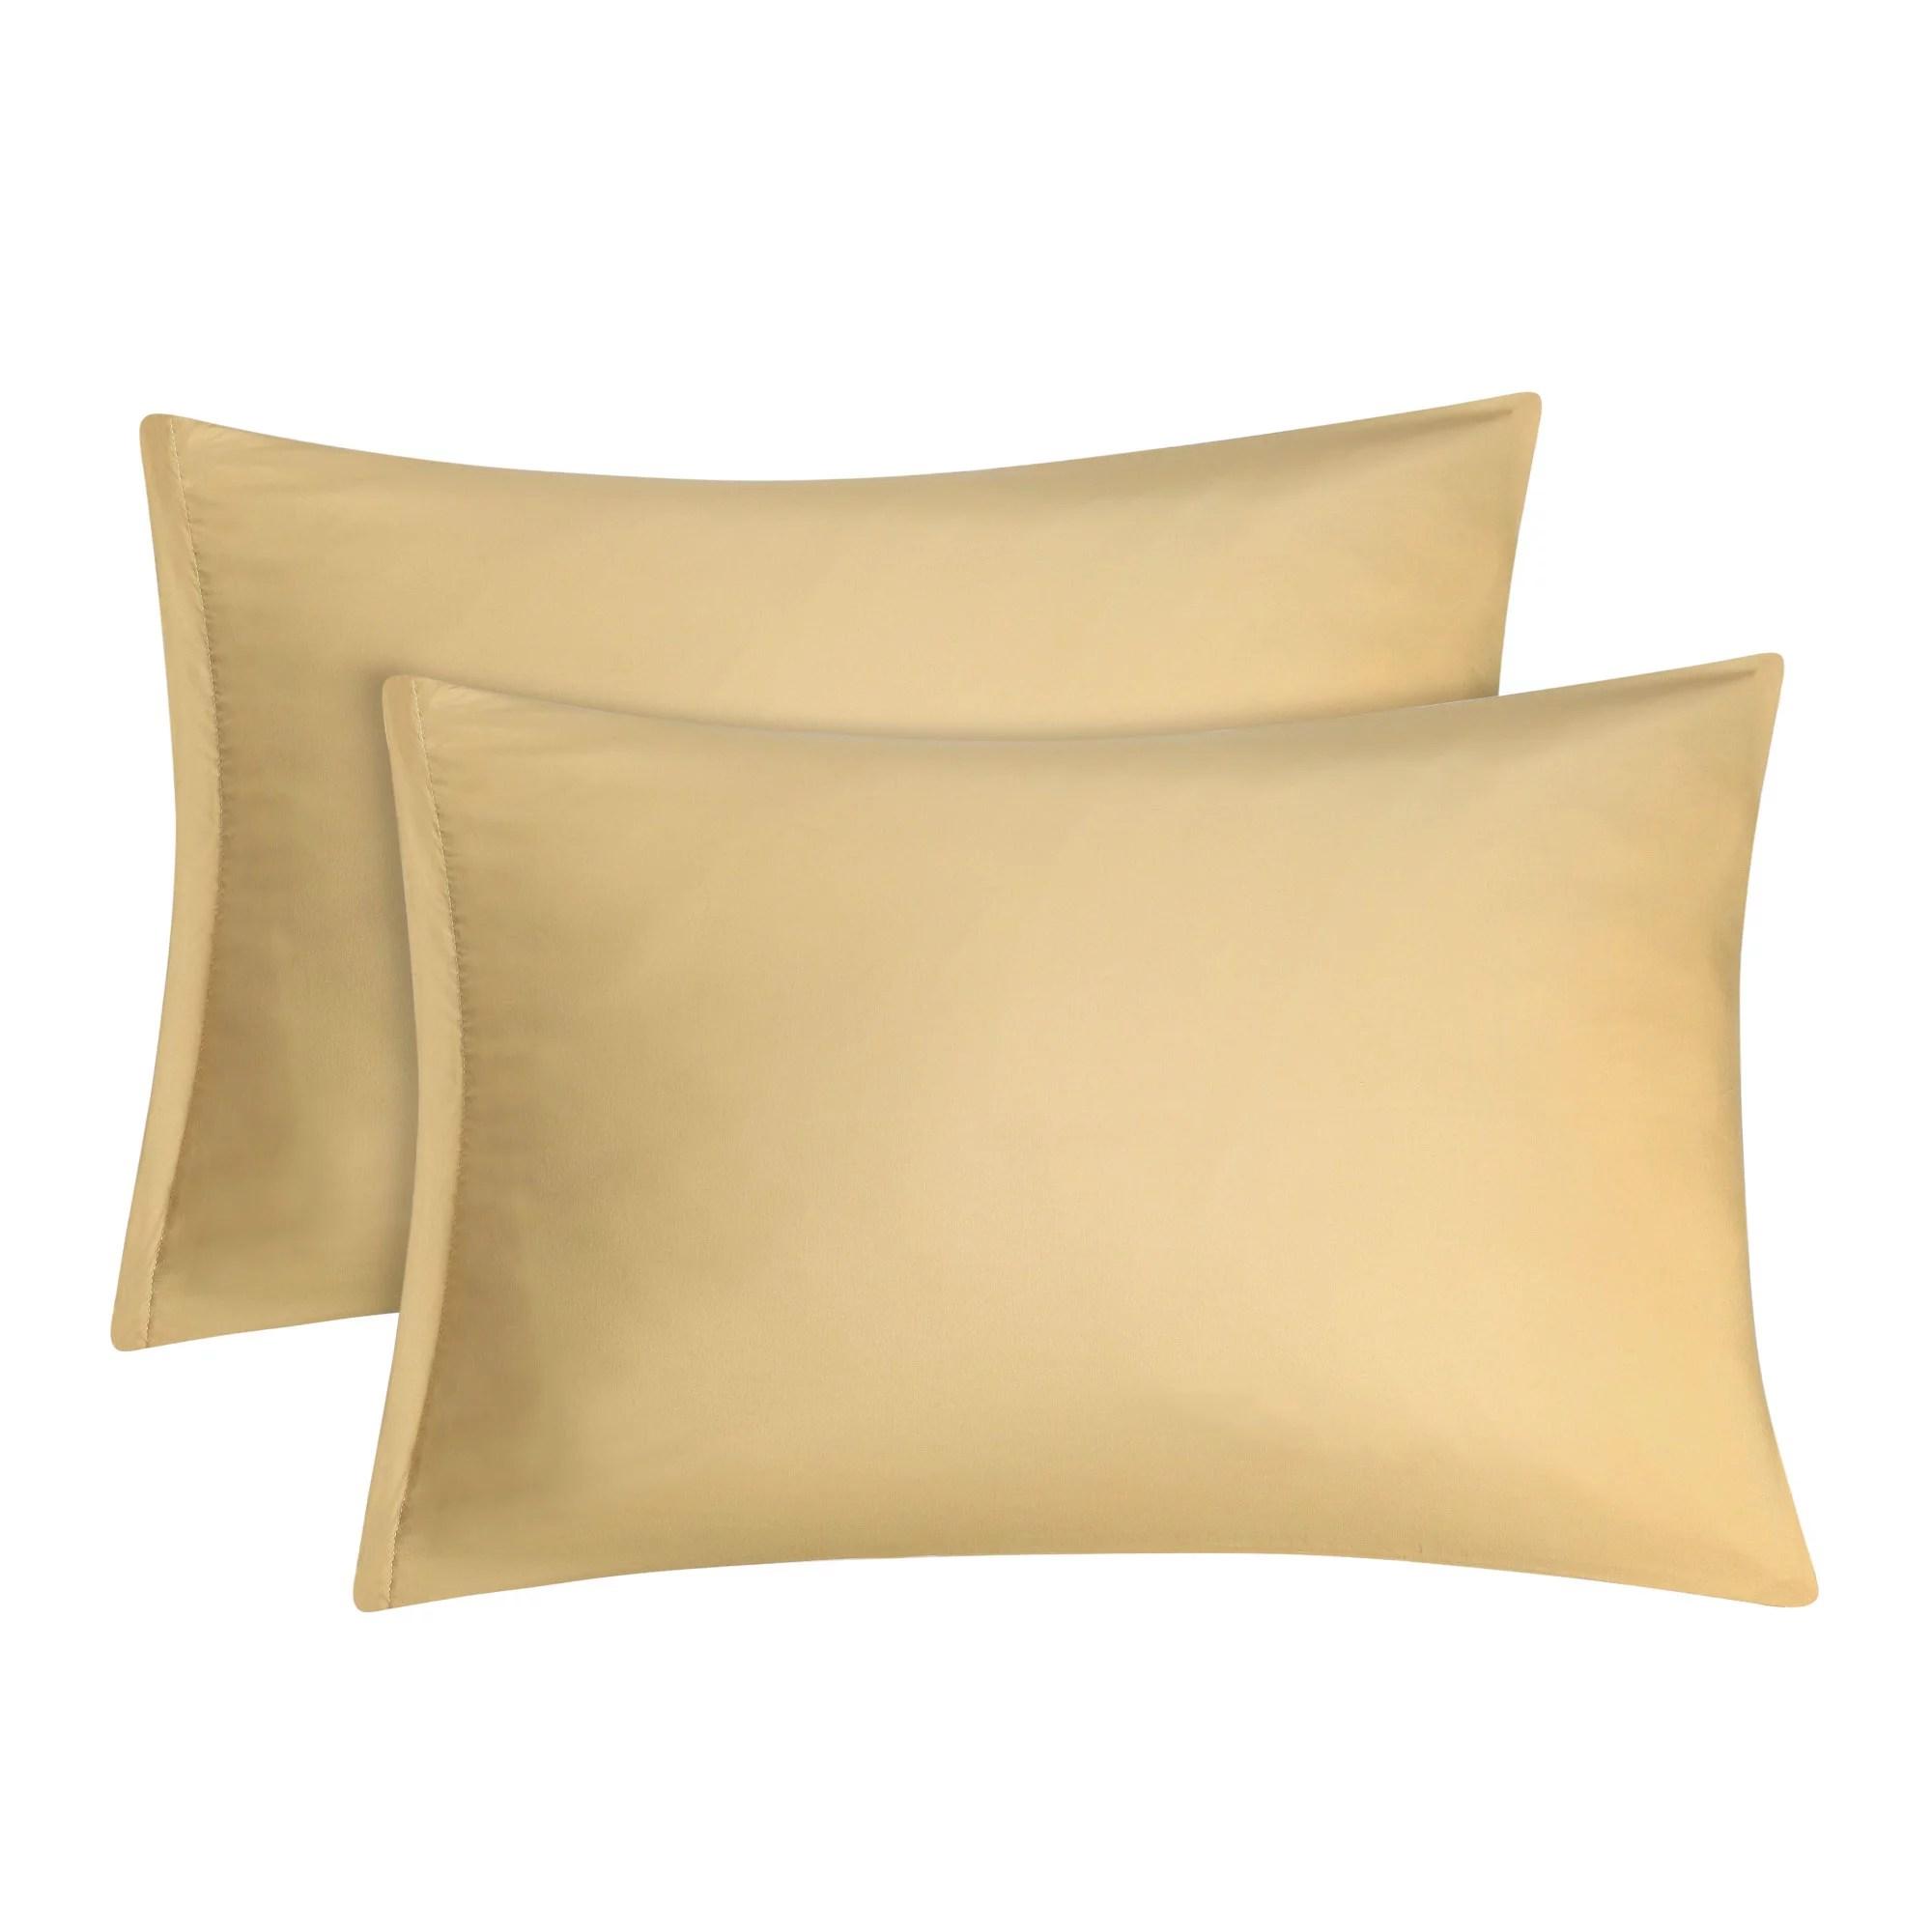 piccocasa 2 pack 1800 microfiber pillow case with zipper closure gold travel 14 x 20